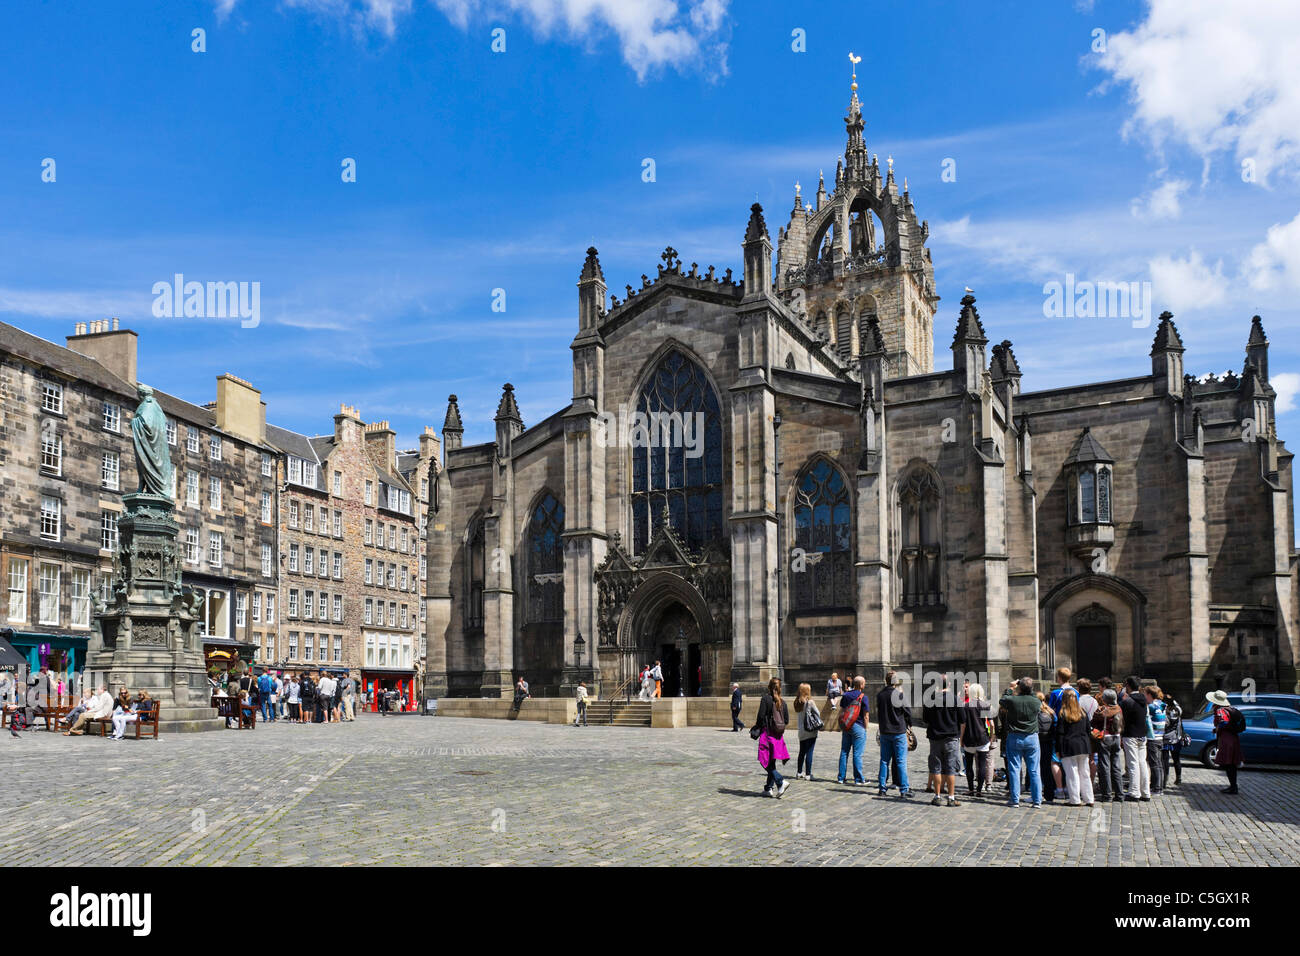 St Giles Cathedral on The Royal Mile, Edinburgh, Scotland, UK - Stock Image